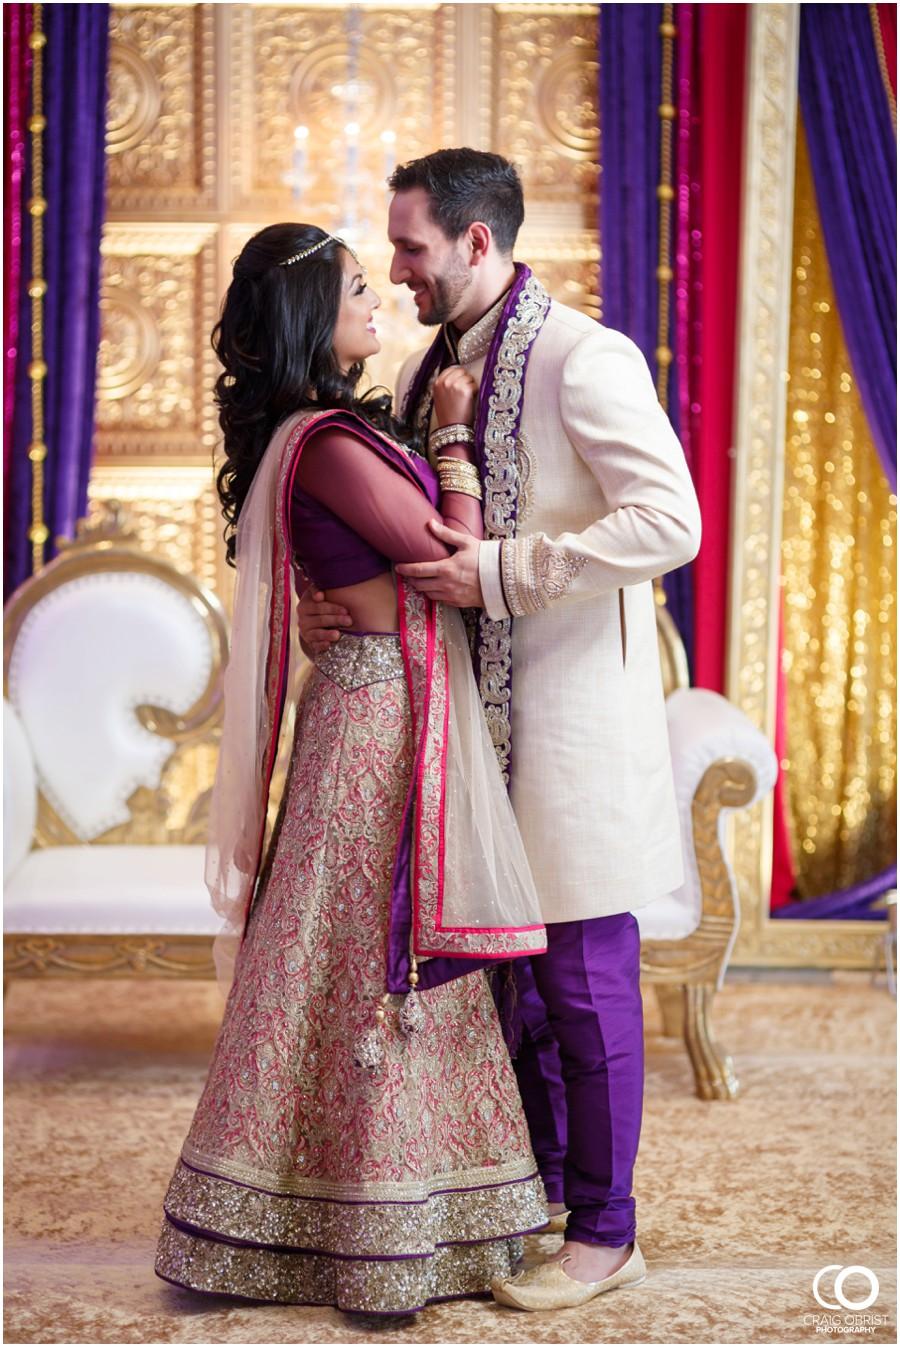 Masuma-Sanjiv-Wedding-lawrenceville-Georgia-Indian_0010.jpg